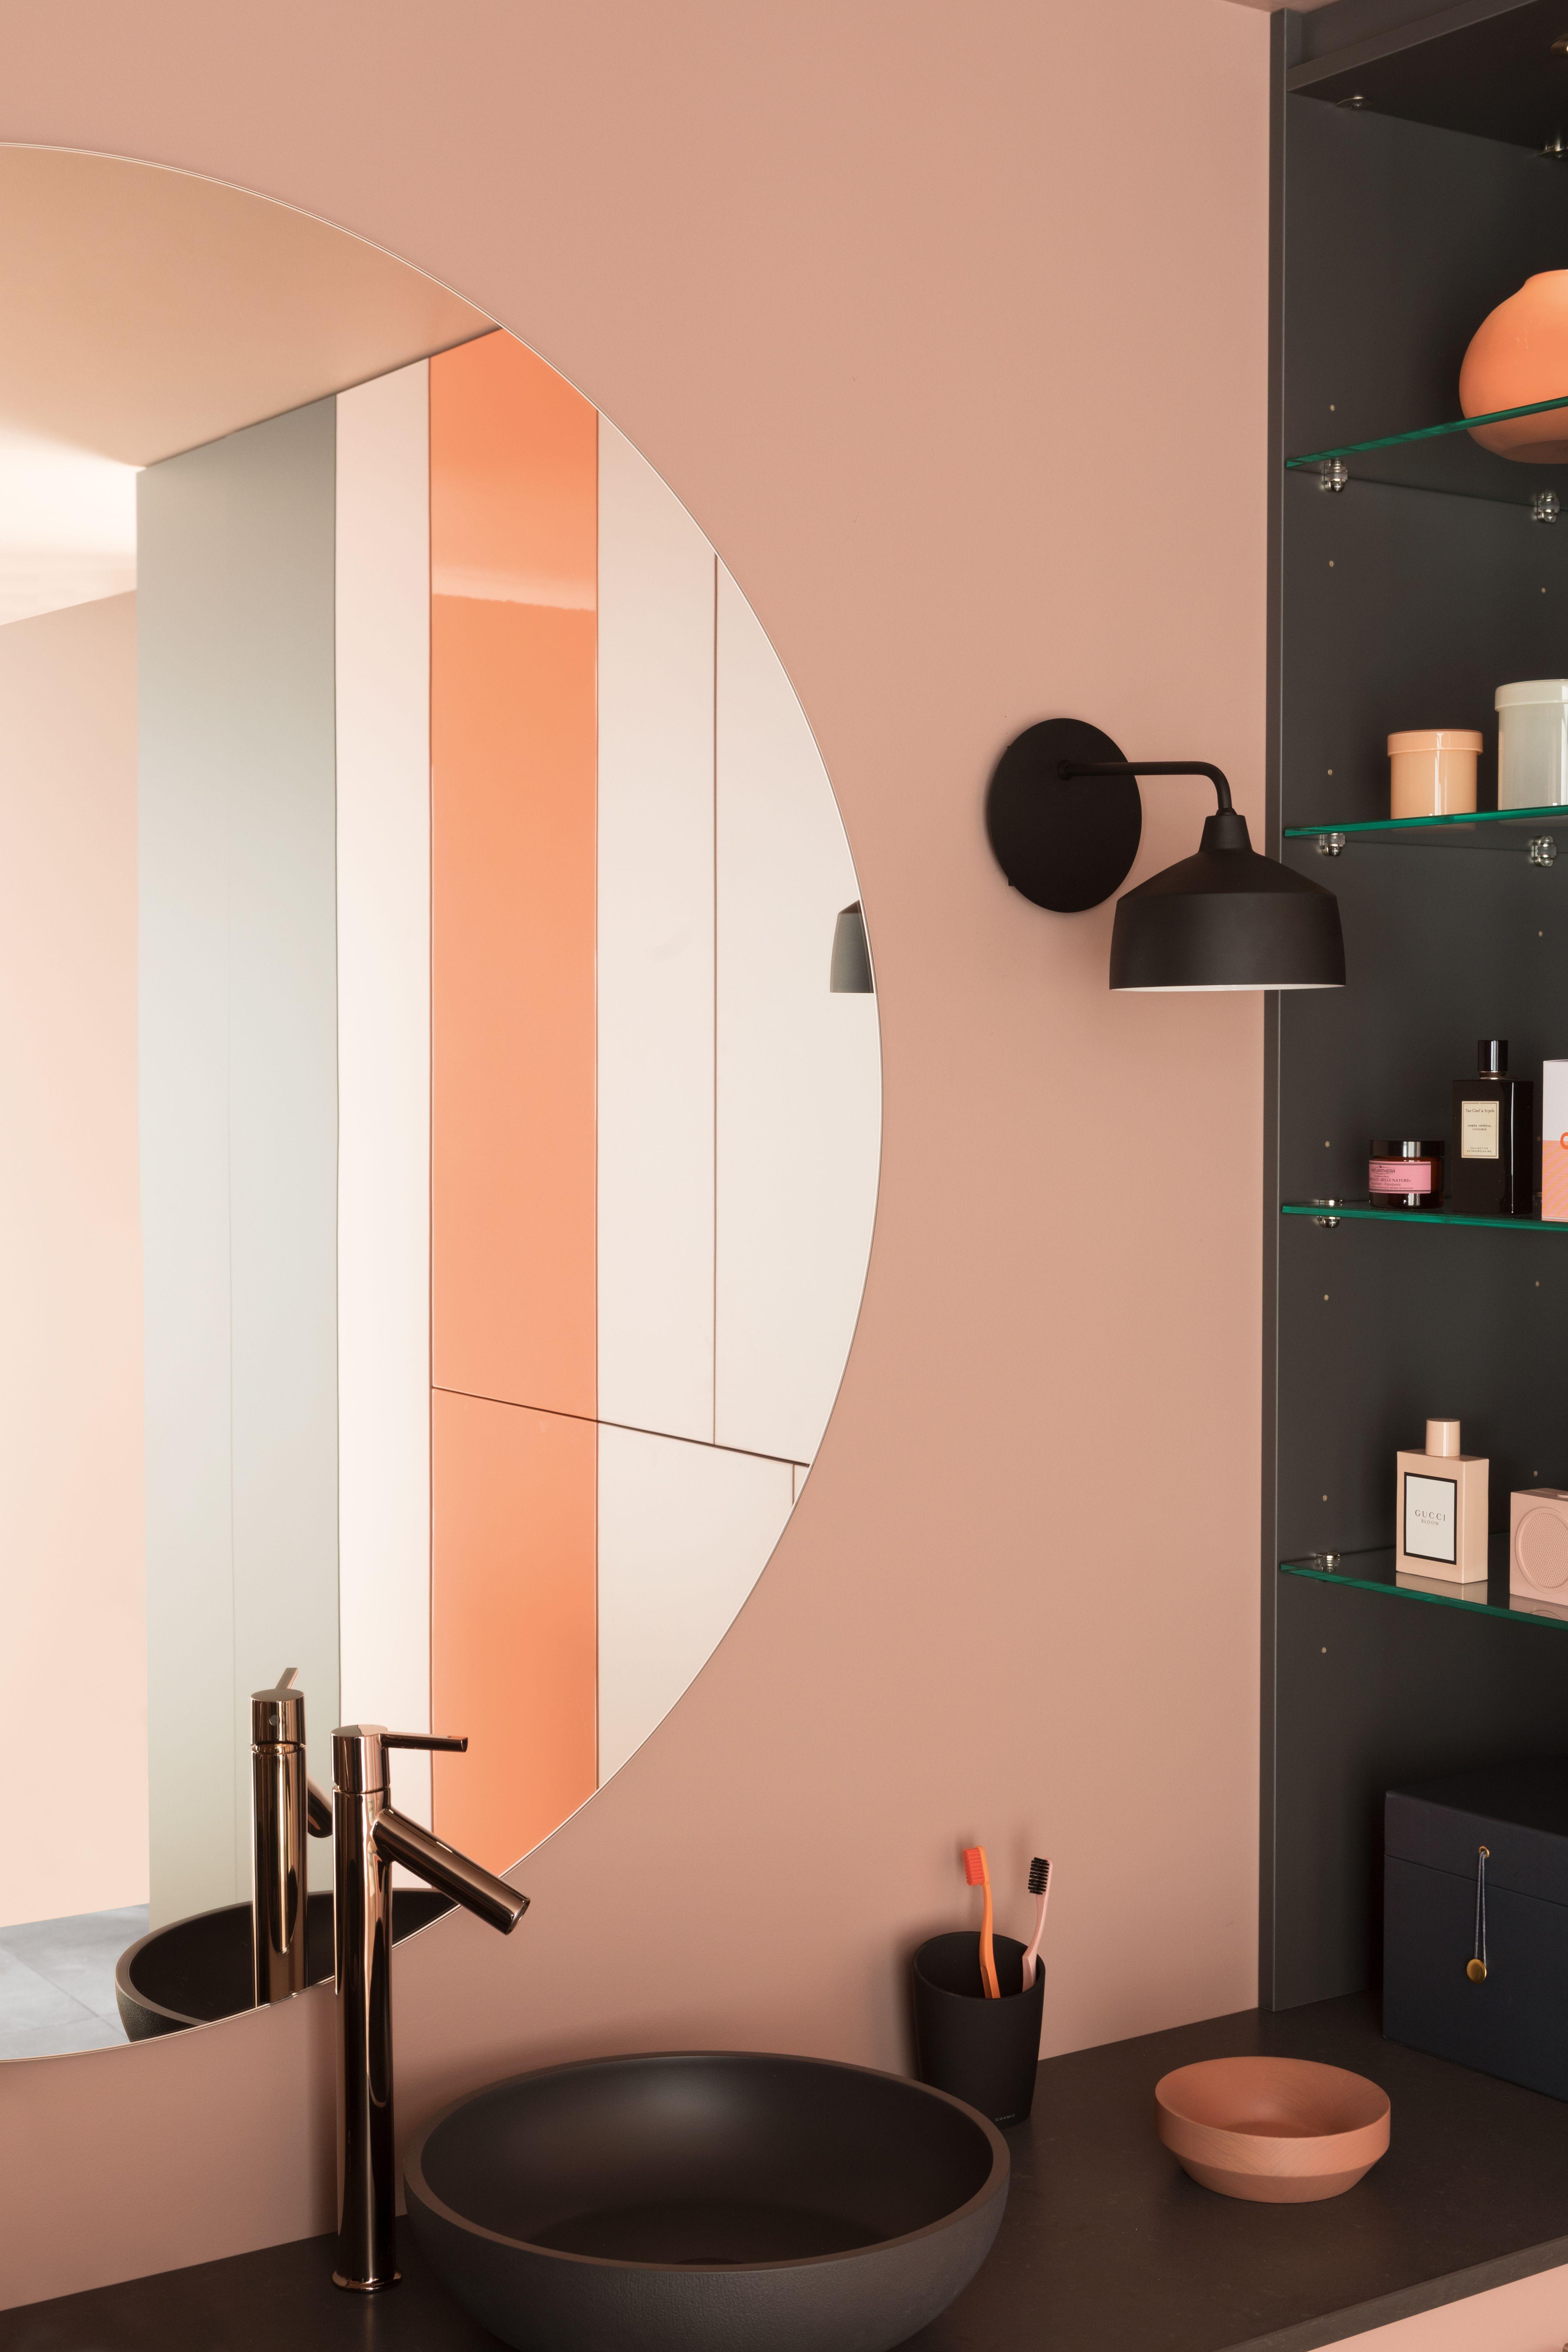 44+ Couleur tendance salle de bain 2019 inspirations